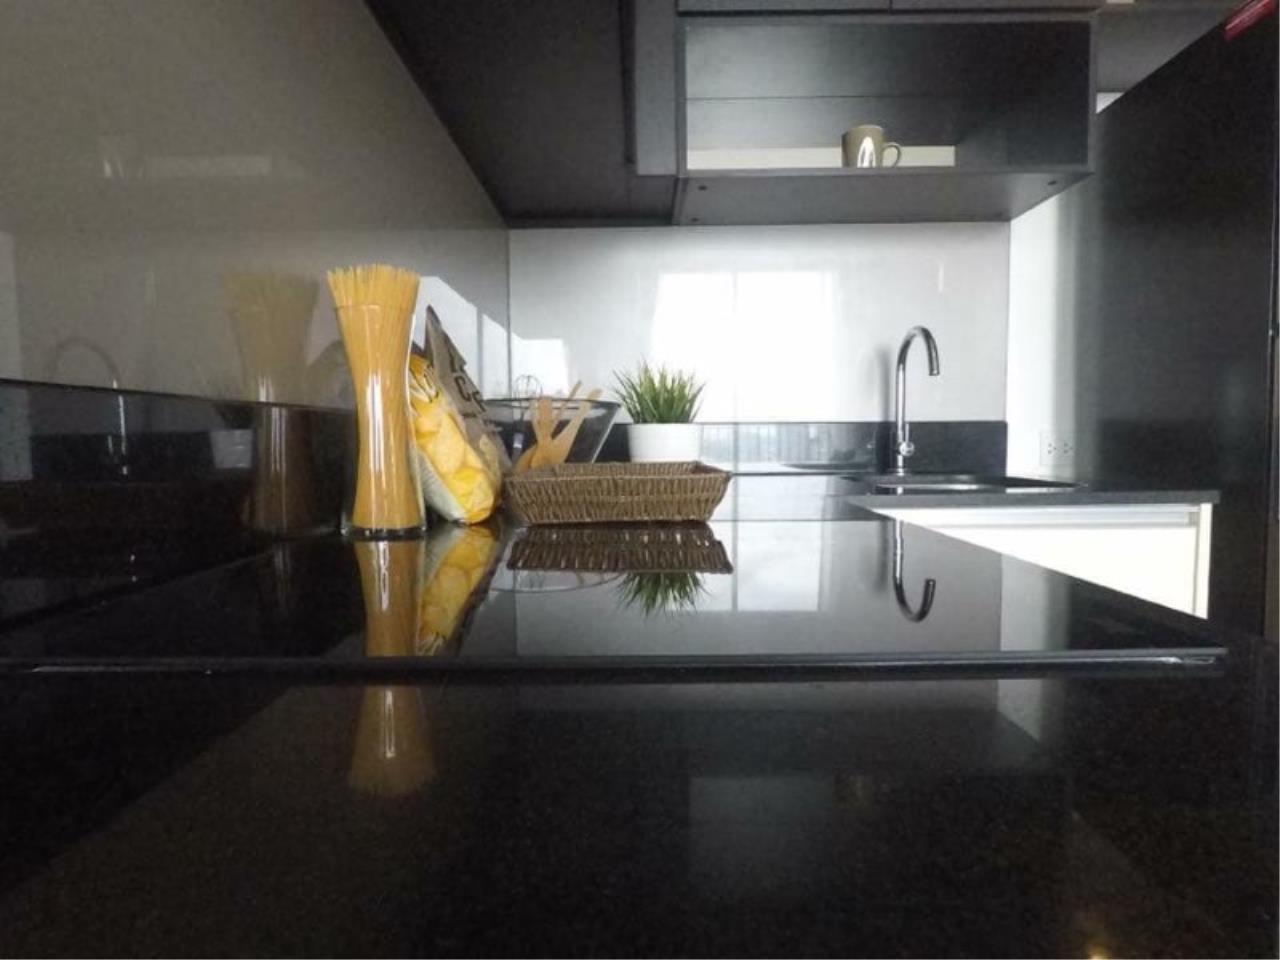 Century21 Skylux Agency's Edge Sukhumvit 23 / Condo For Rent / 1 Bedroom / 42 SQM / BTS Asok / Bangkok 5